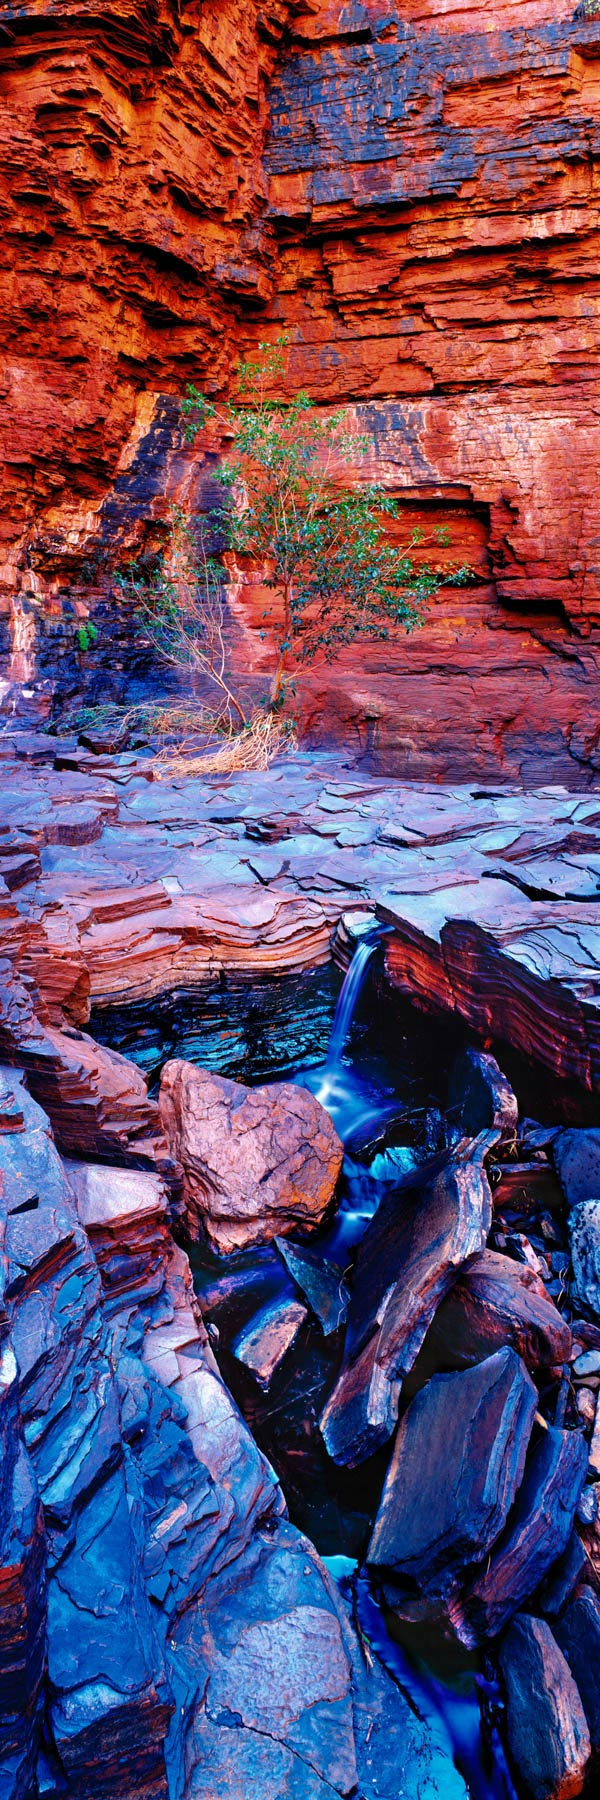 End Pool in Weano Gorge, Karijini National Park, WA, Australia.